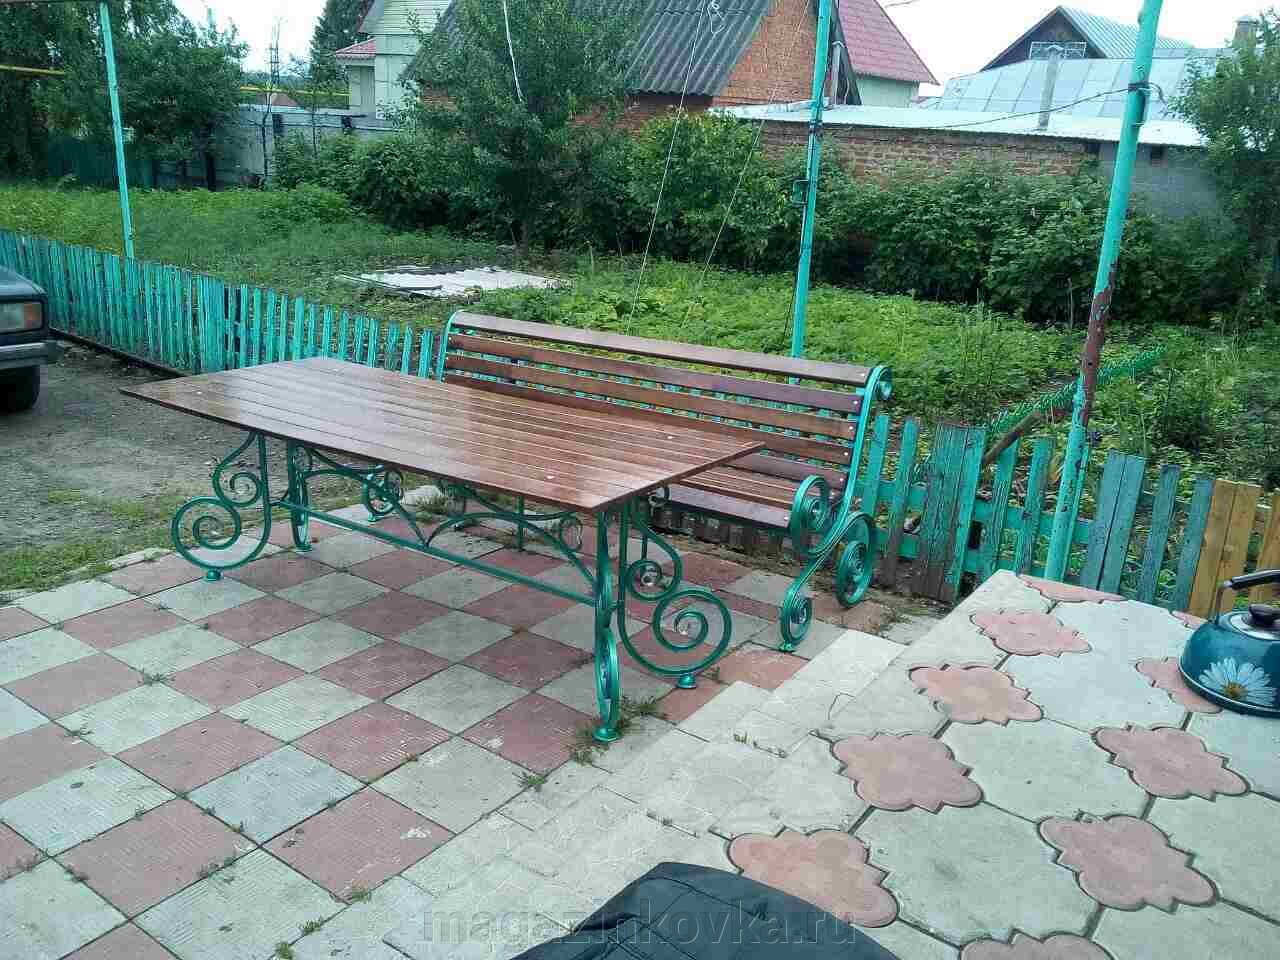 Скамейки садовые кованые металлические - фото pic_b358aef78081794a3cb182d034b52acc_1920x9000_1.jpg